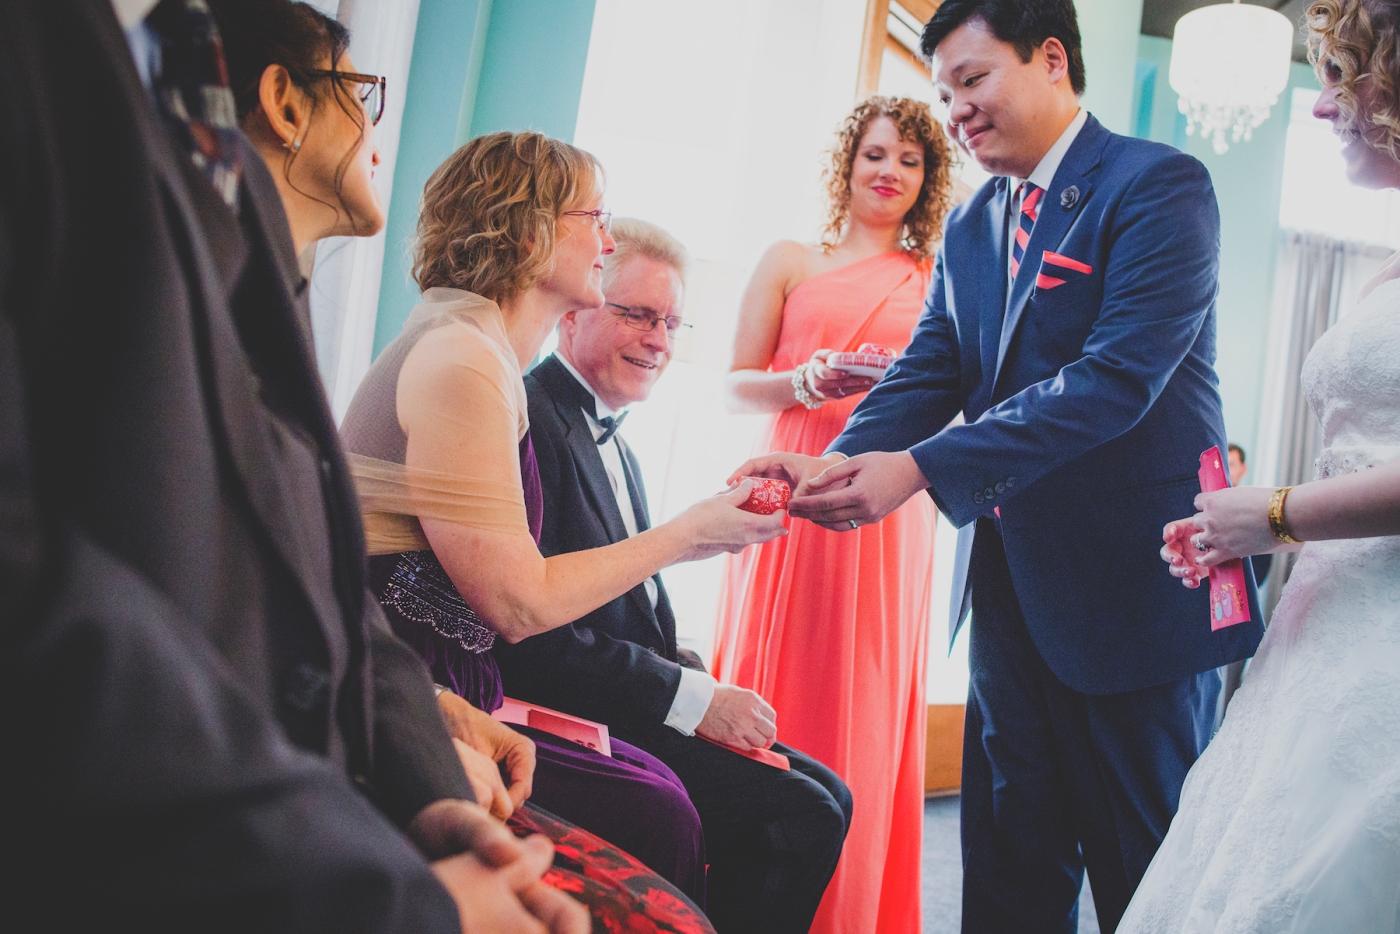 DSC_2994Everett_Wedding_Ballroom_Jane_Speleers_photography_Rachel_and_Edmund_teaceremony_2017